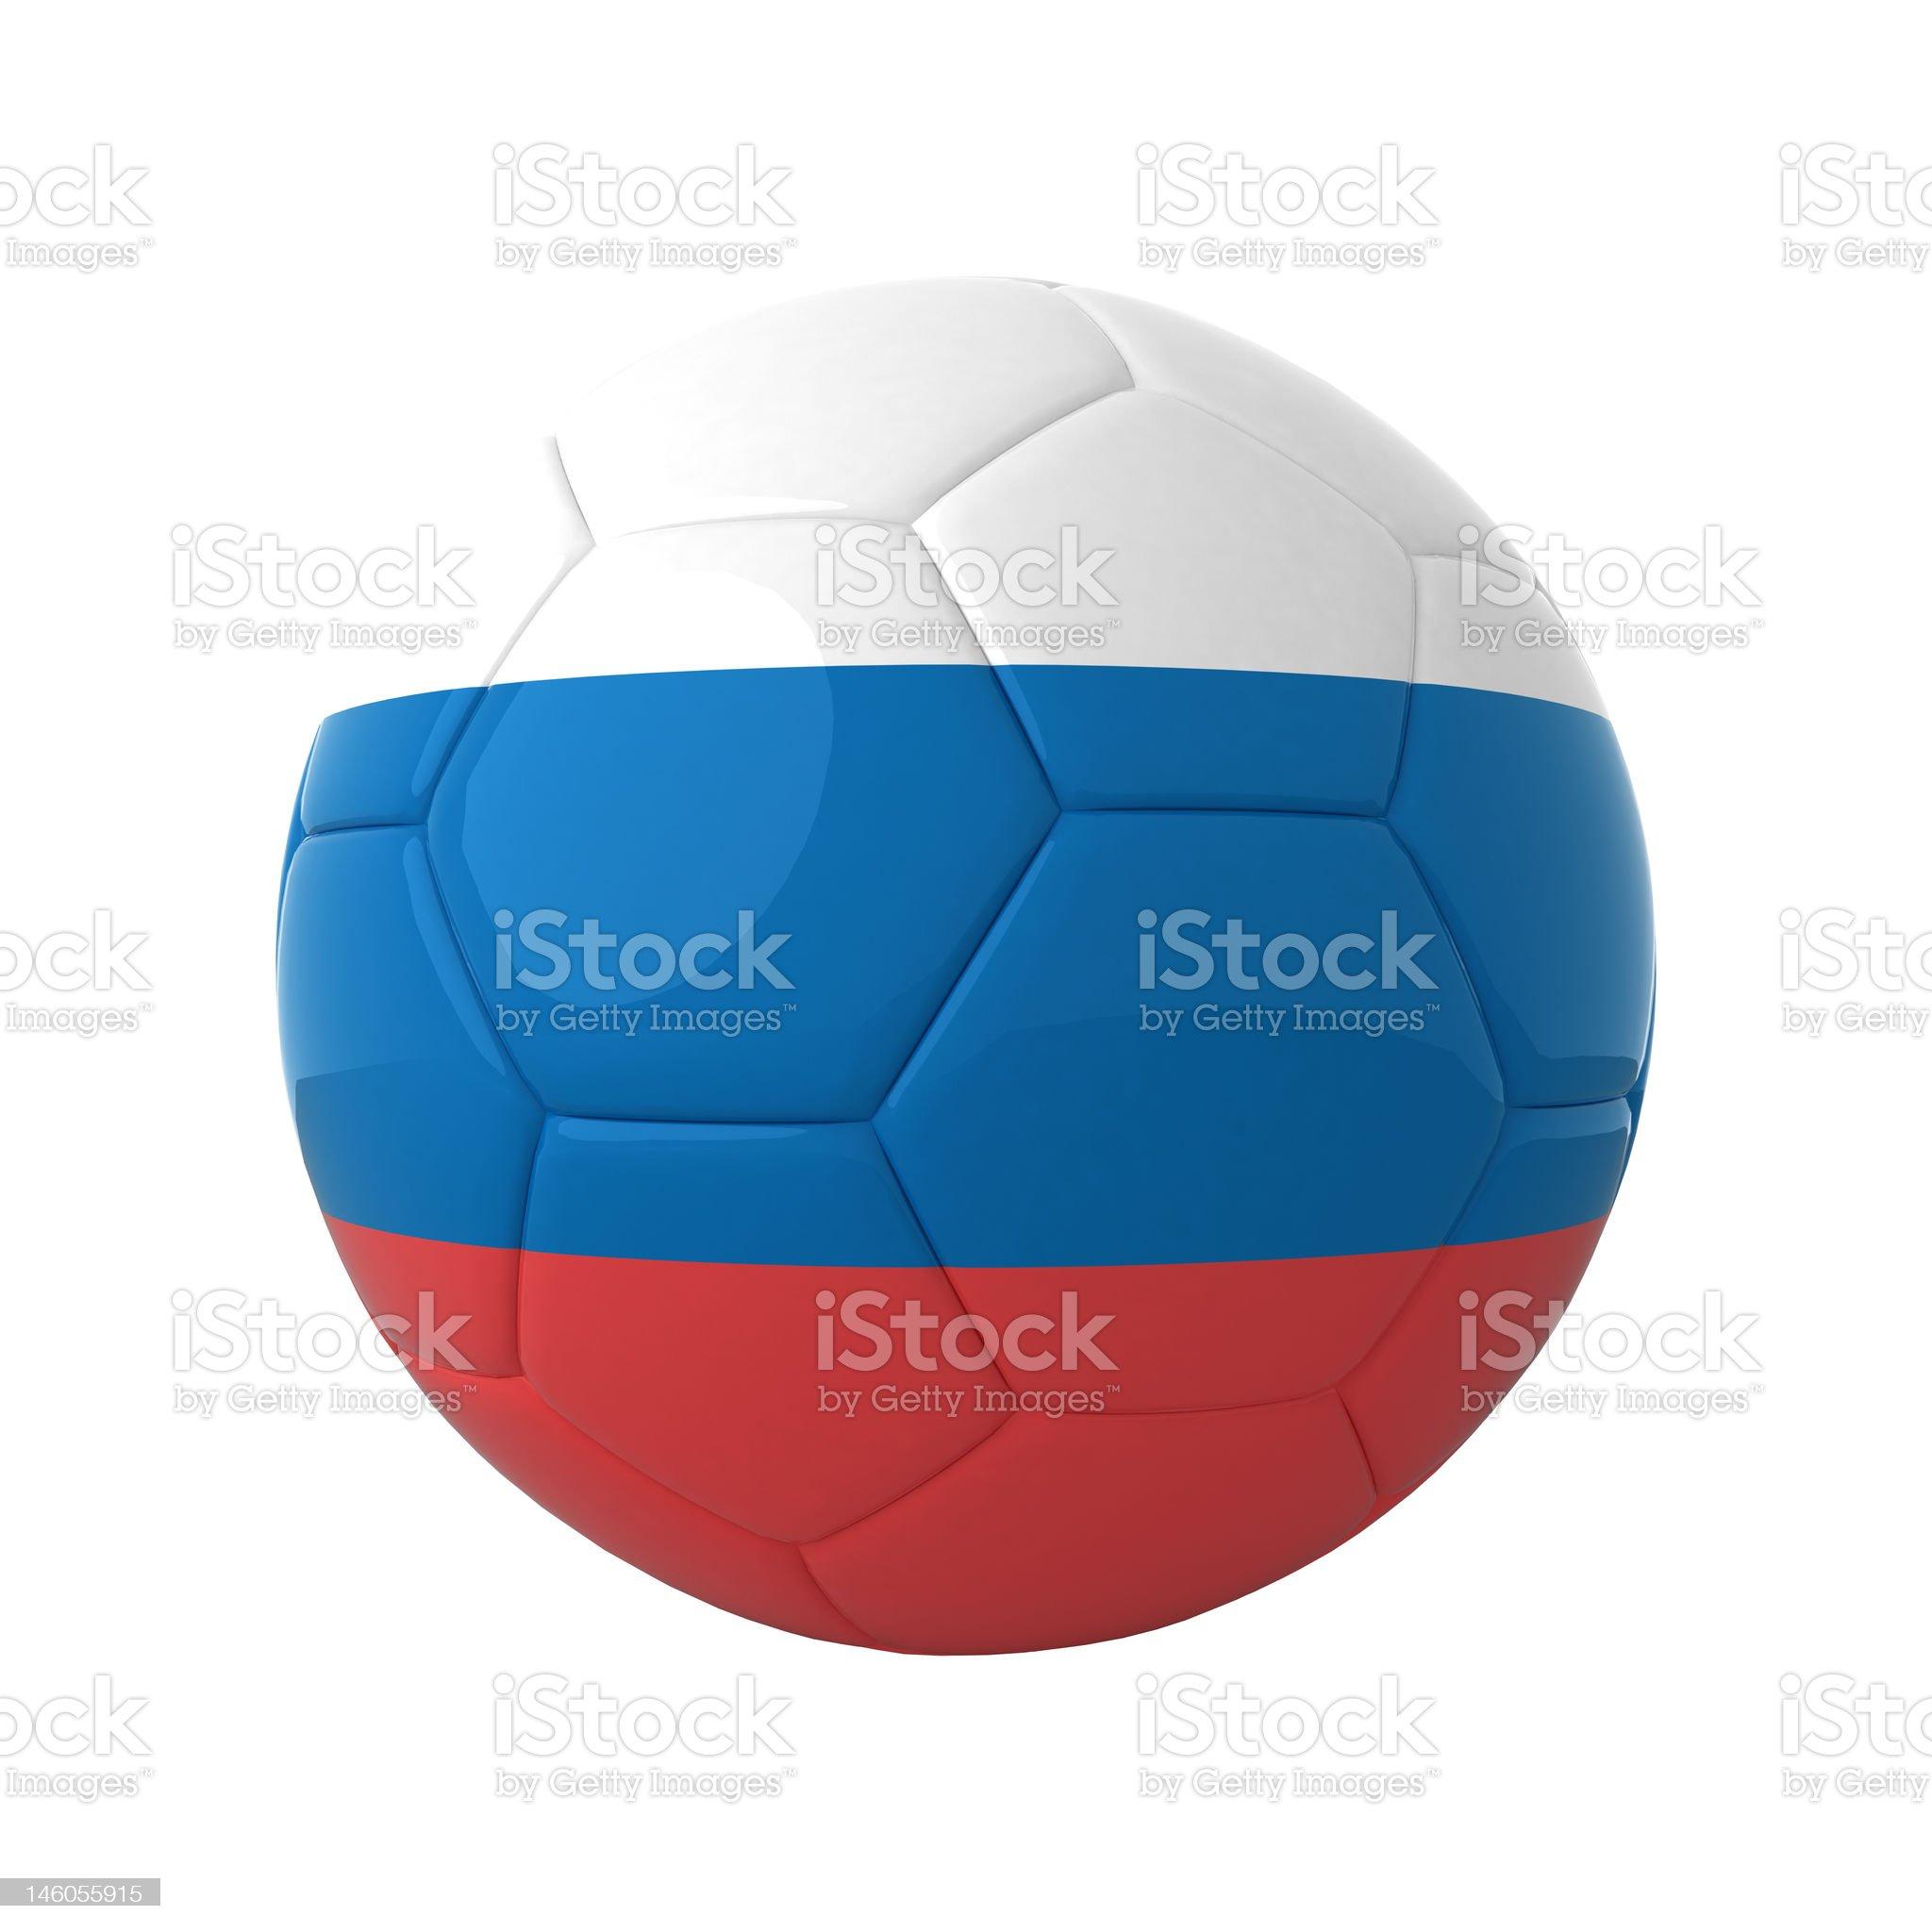 Russian soccer. royalty-free stock vector art